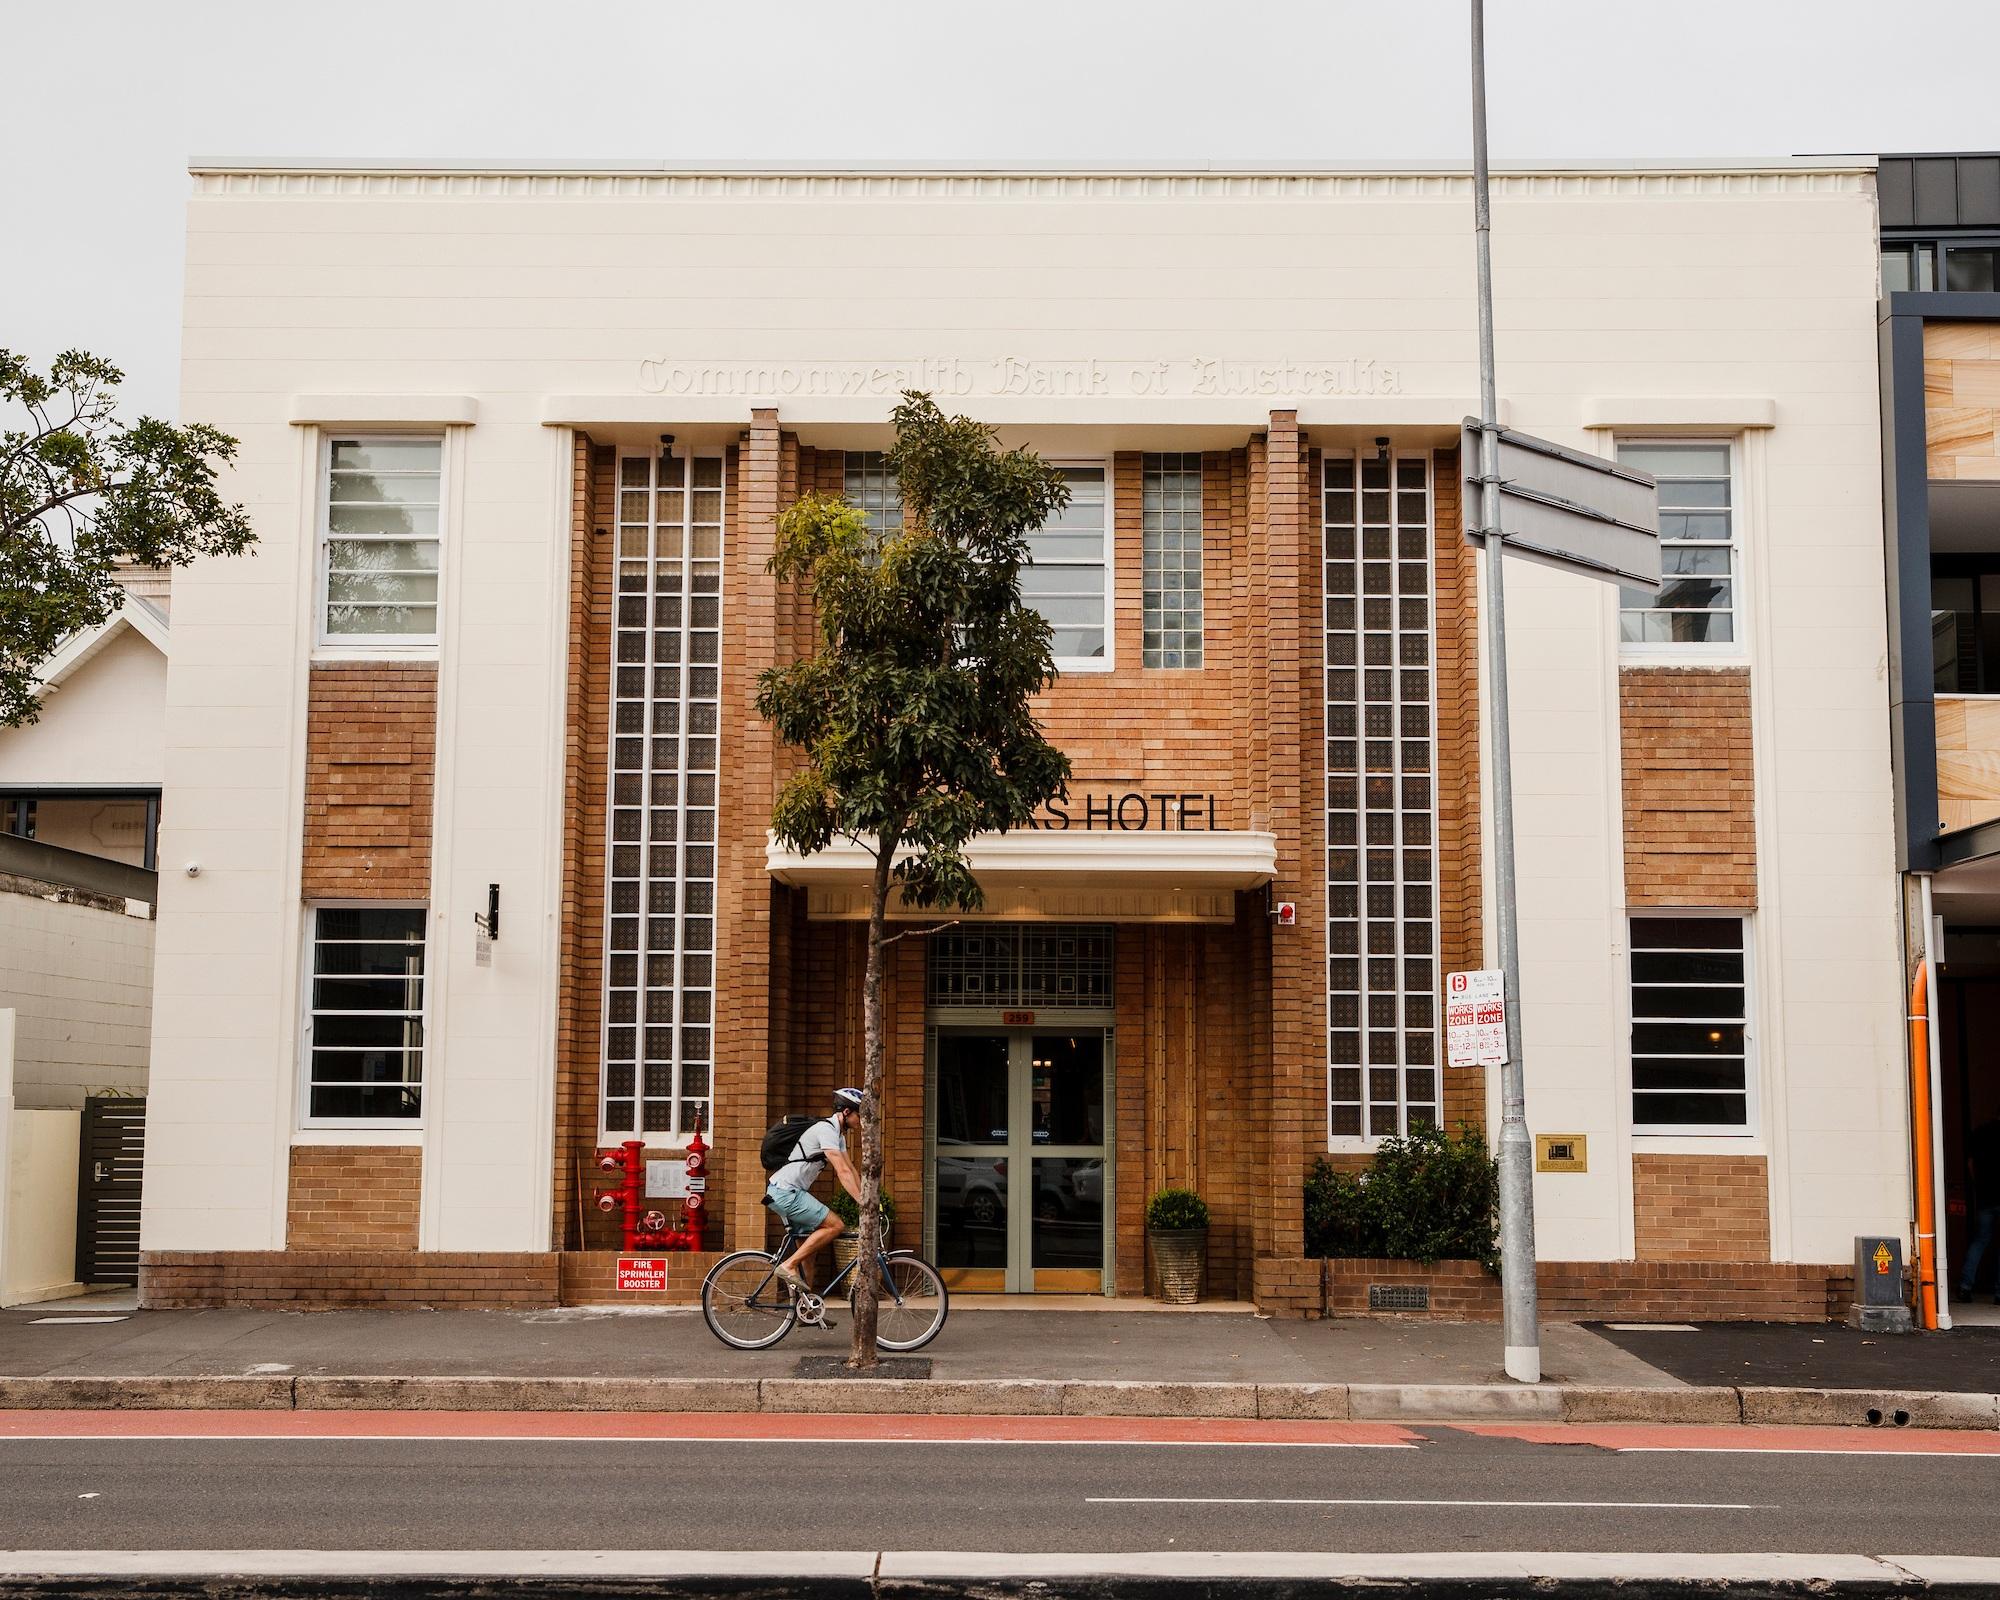 MRS BANKS HOTEL - 259 OXFORD STREET